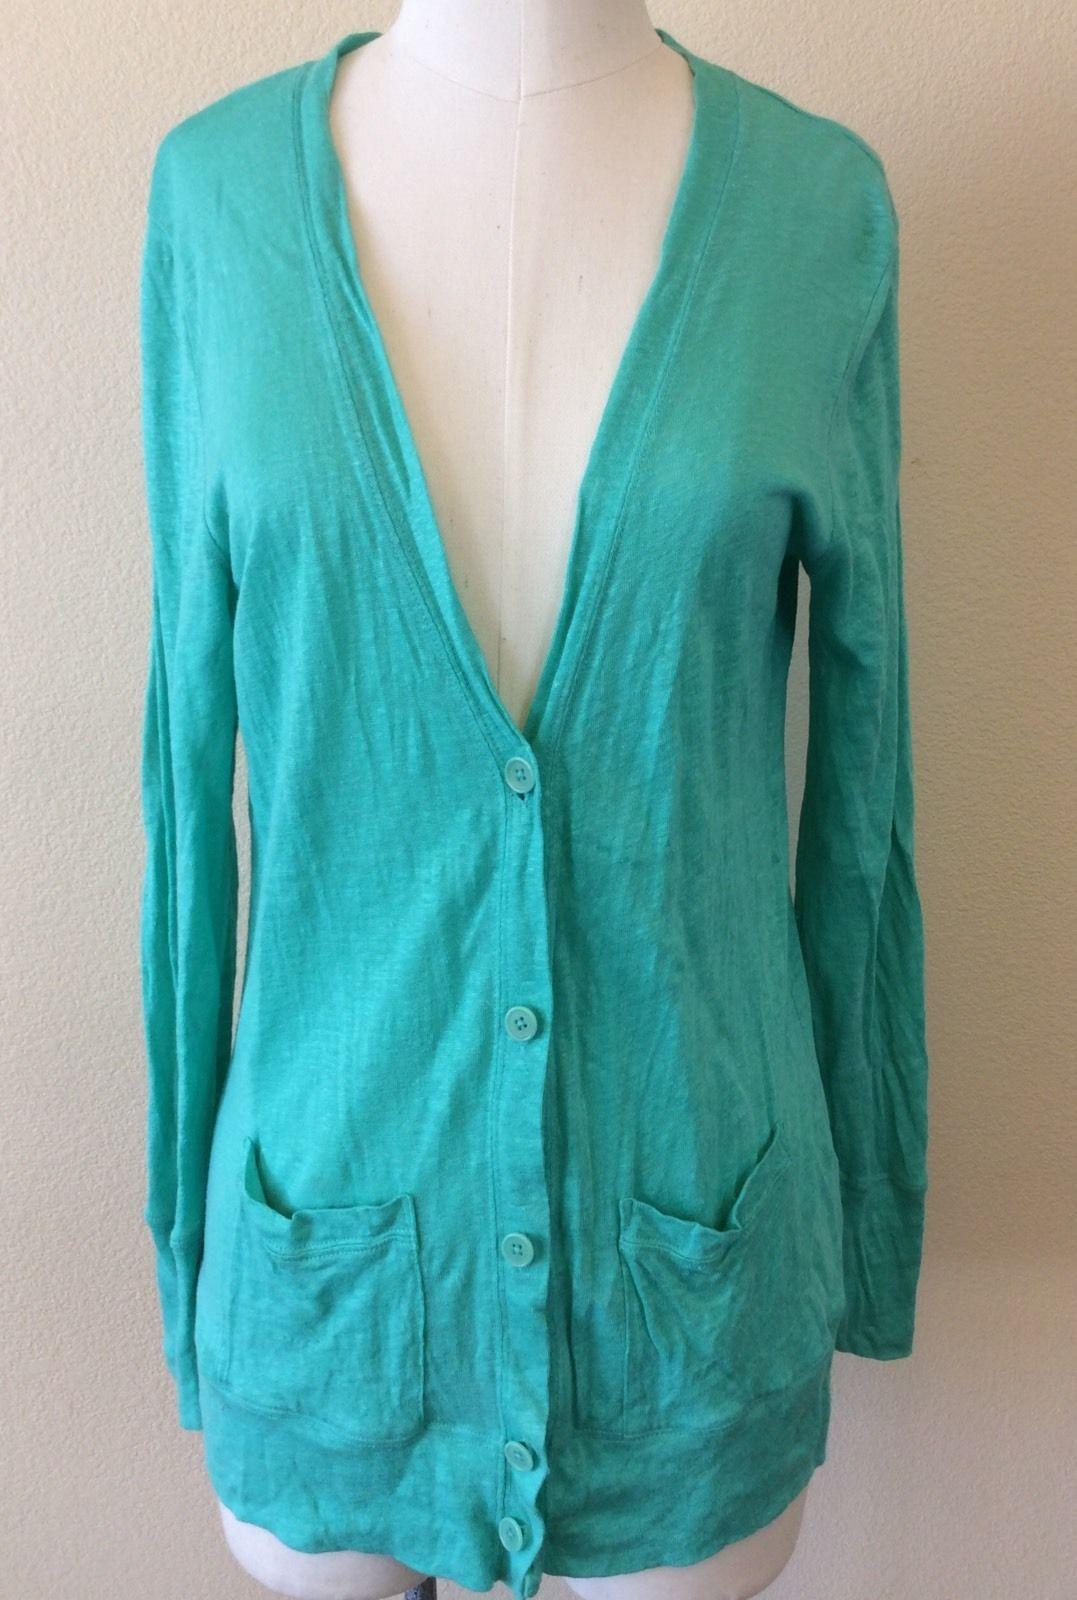 J. CREW Womens Teal Cardigan Sweater Long Sleeve 100% Linen Knit ...